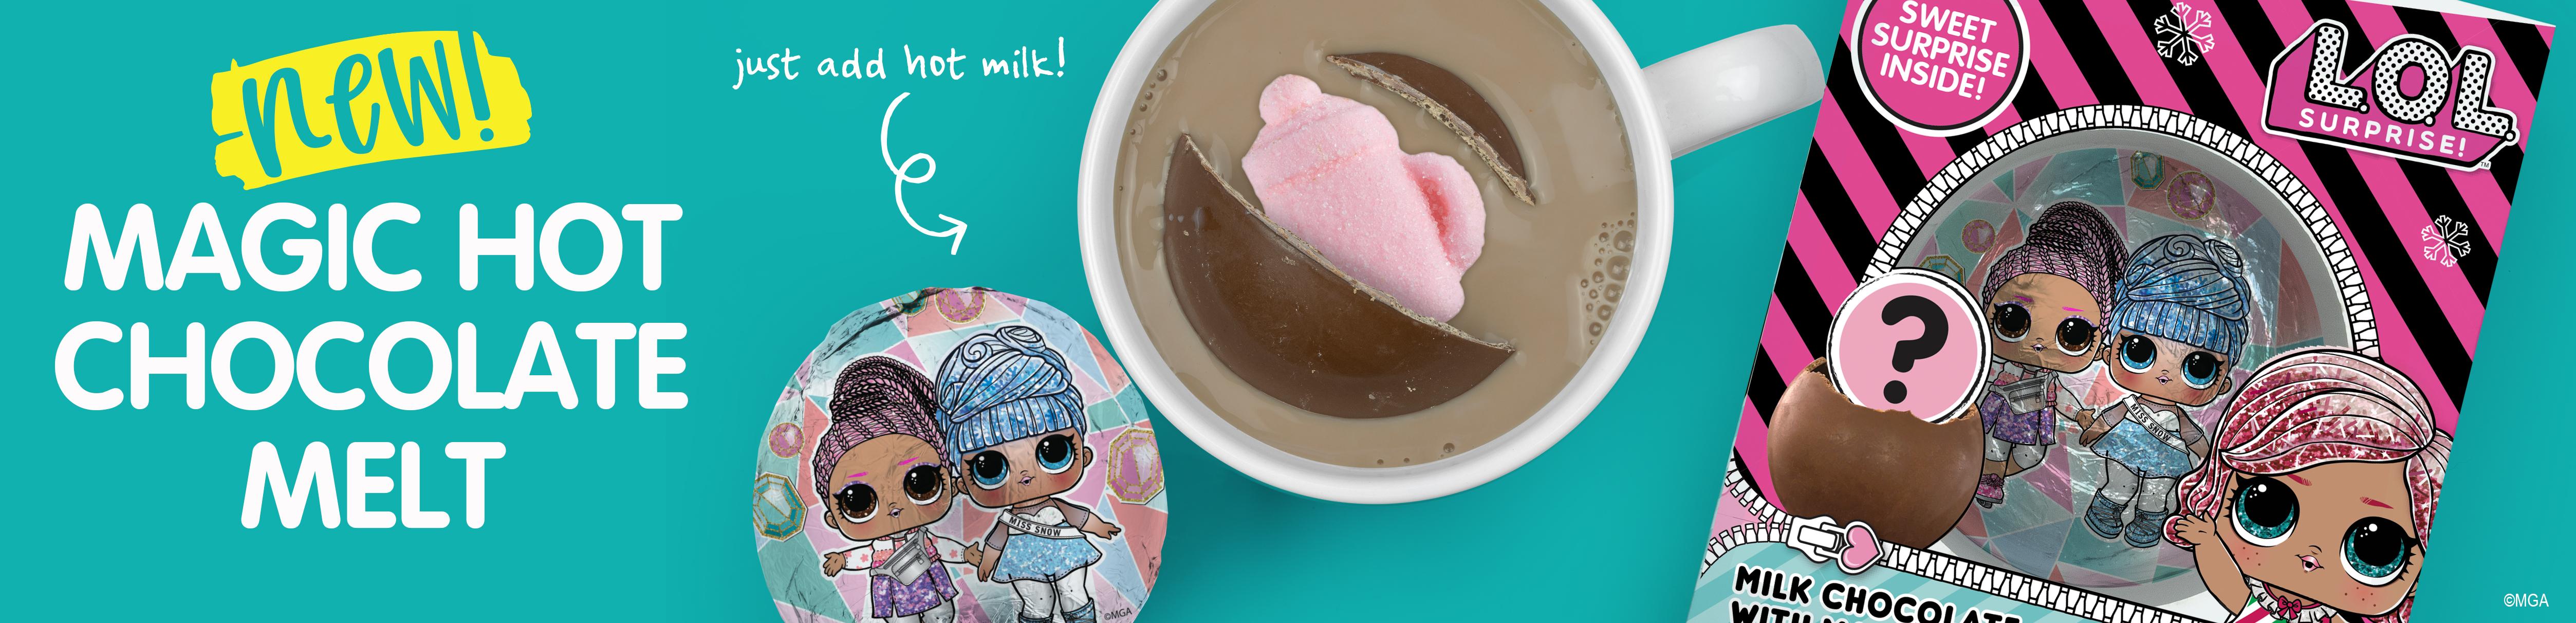 listing-magic-hot-chocolate-melts.jpg